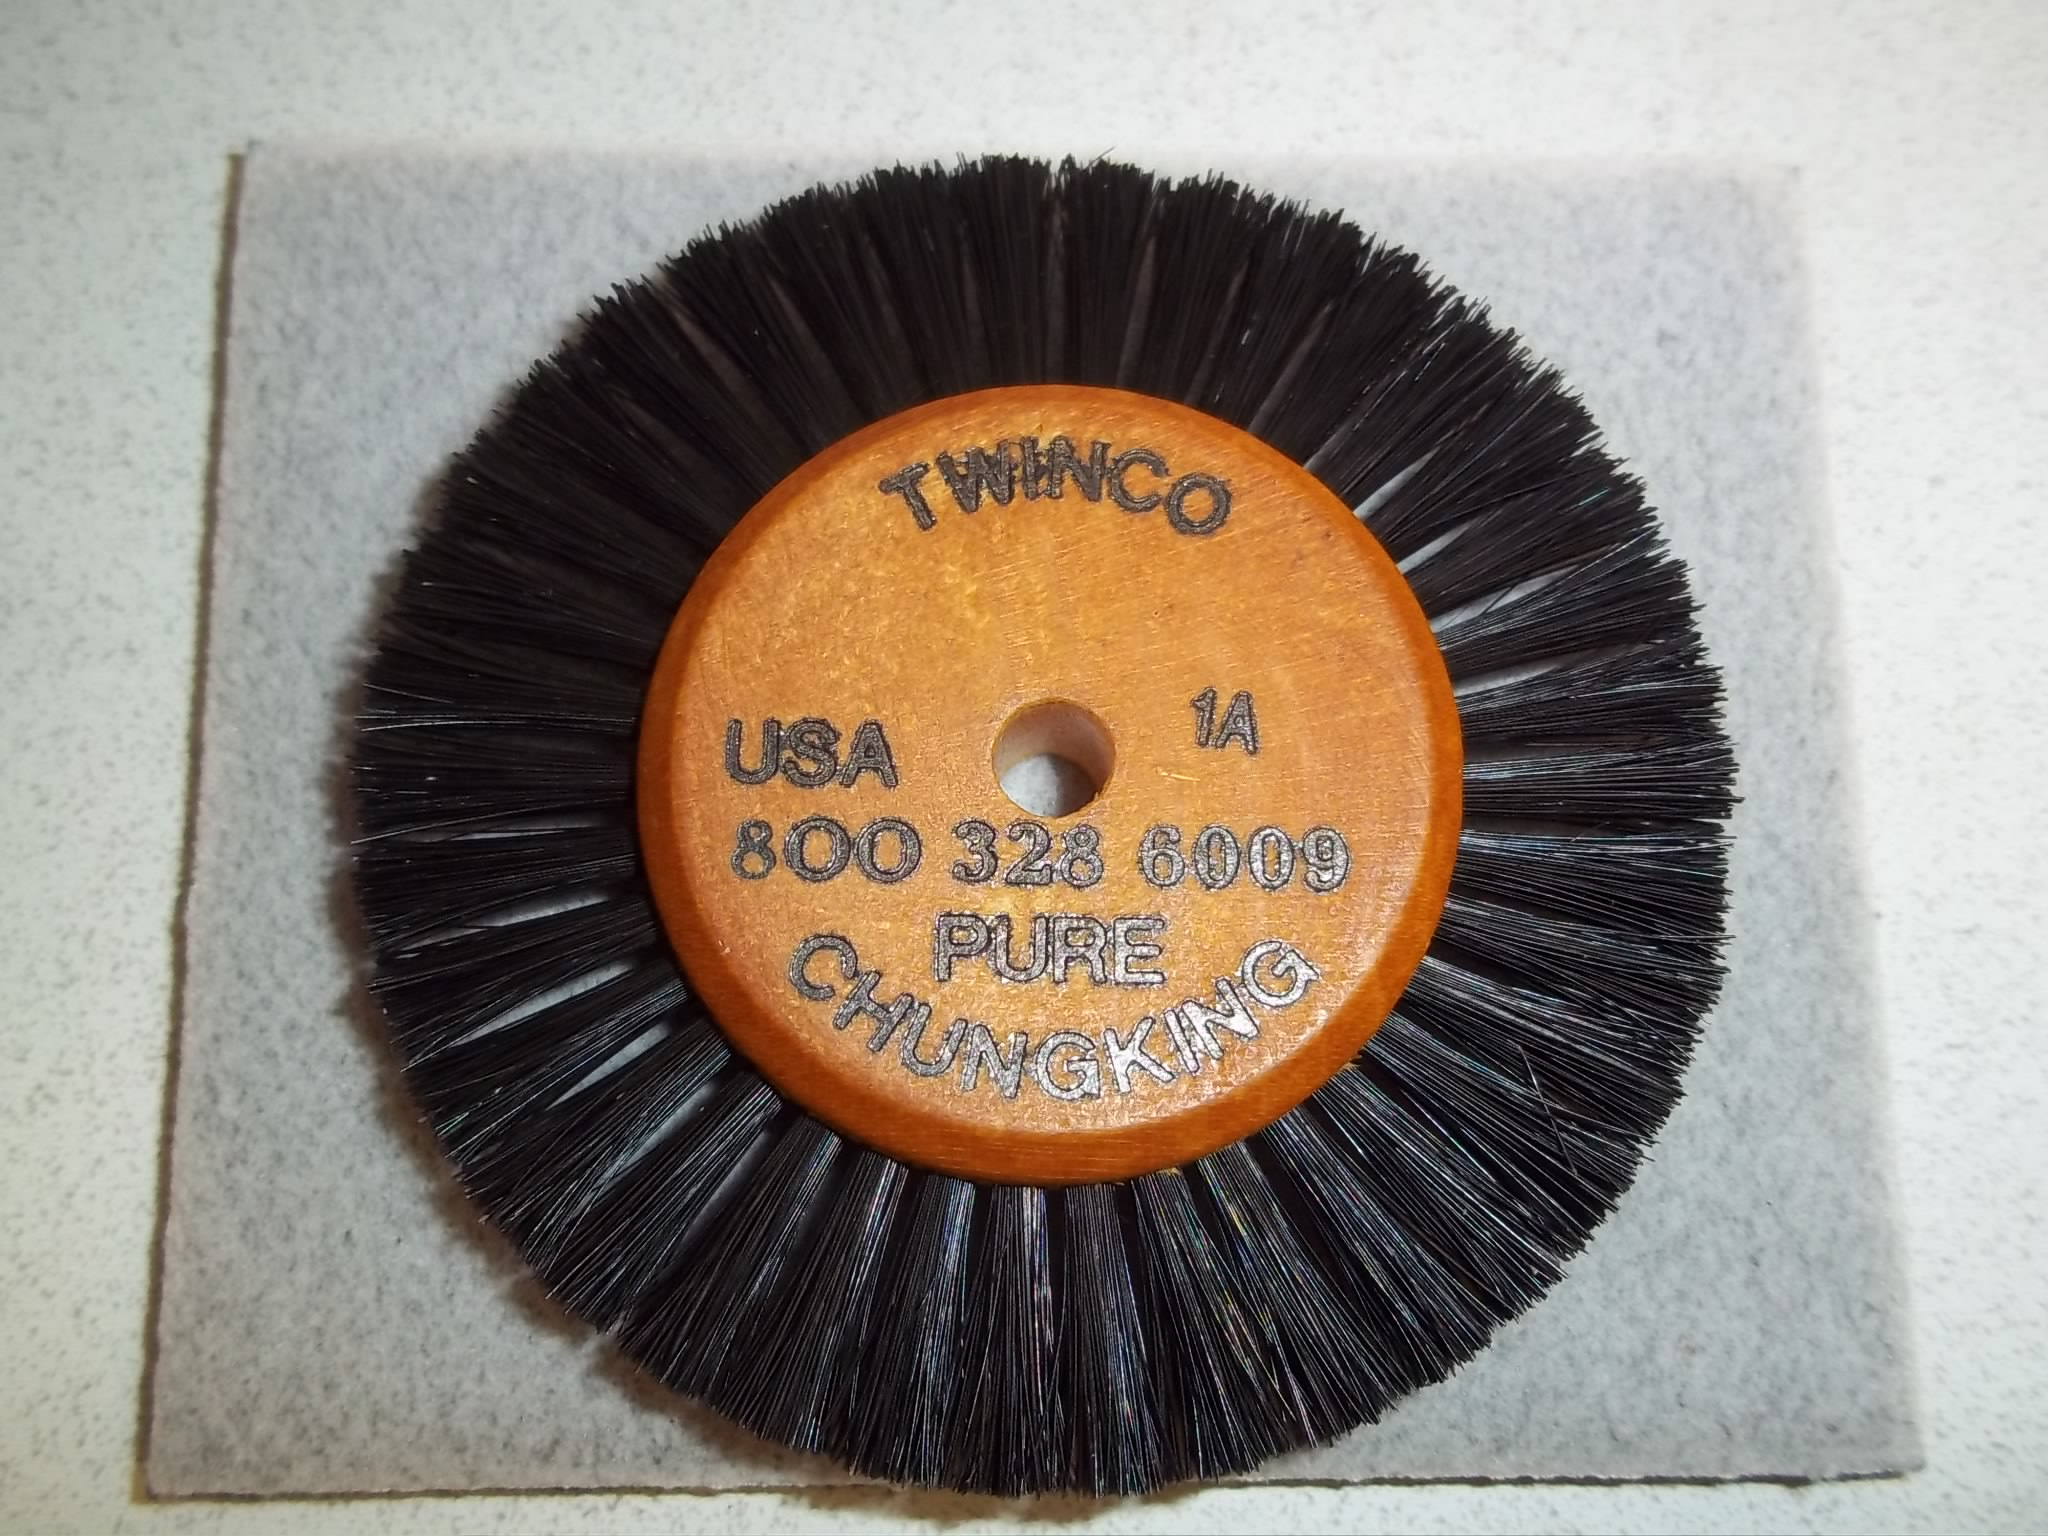 "BU529 Wood Hub Brush, 1 Row of Bristle, 3-1/8"" Overall Diameter Grobet# 16.398"